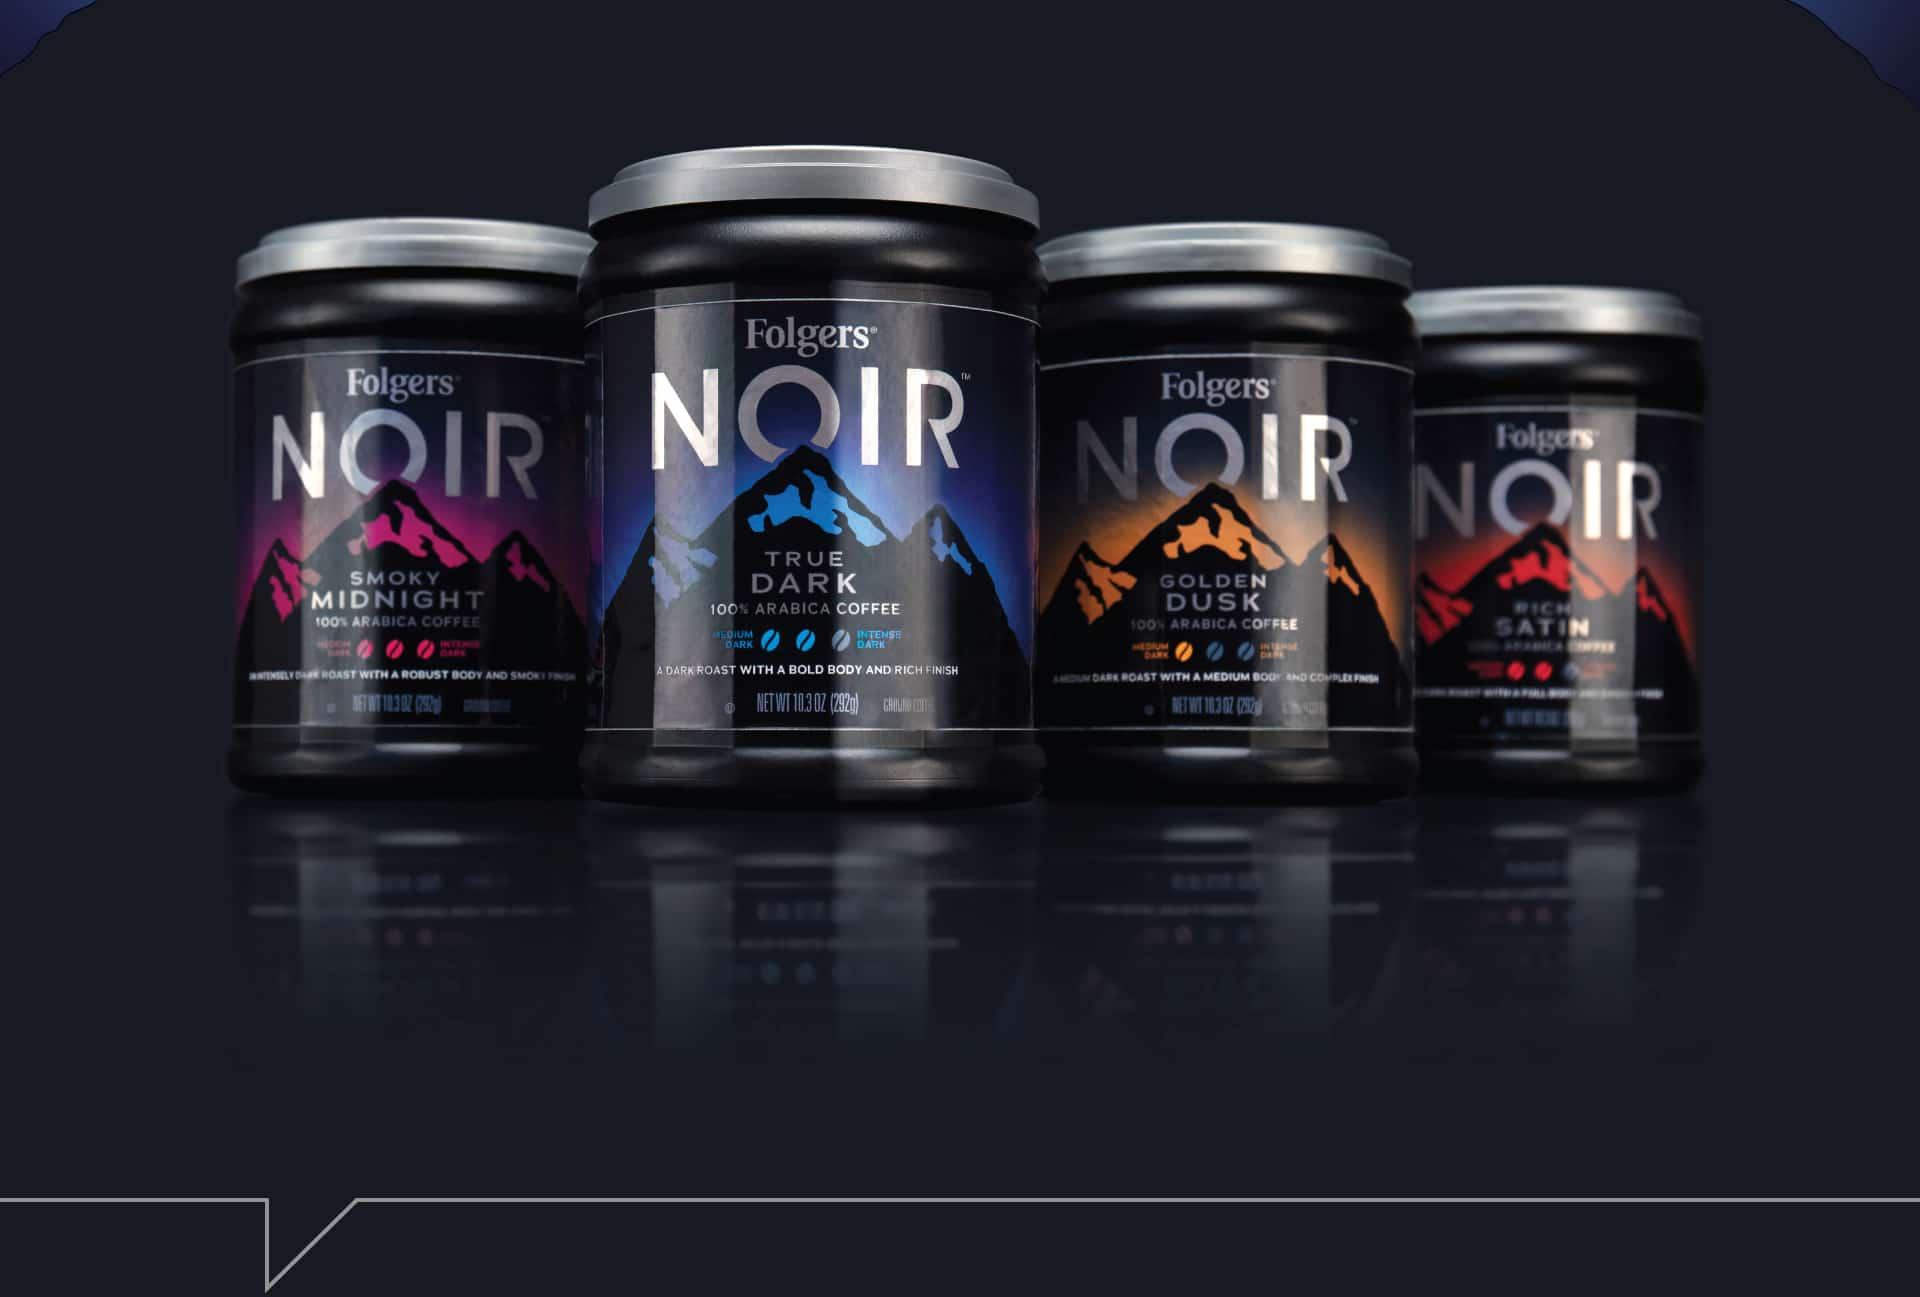 Folgers Noir - Packaging Design